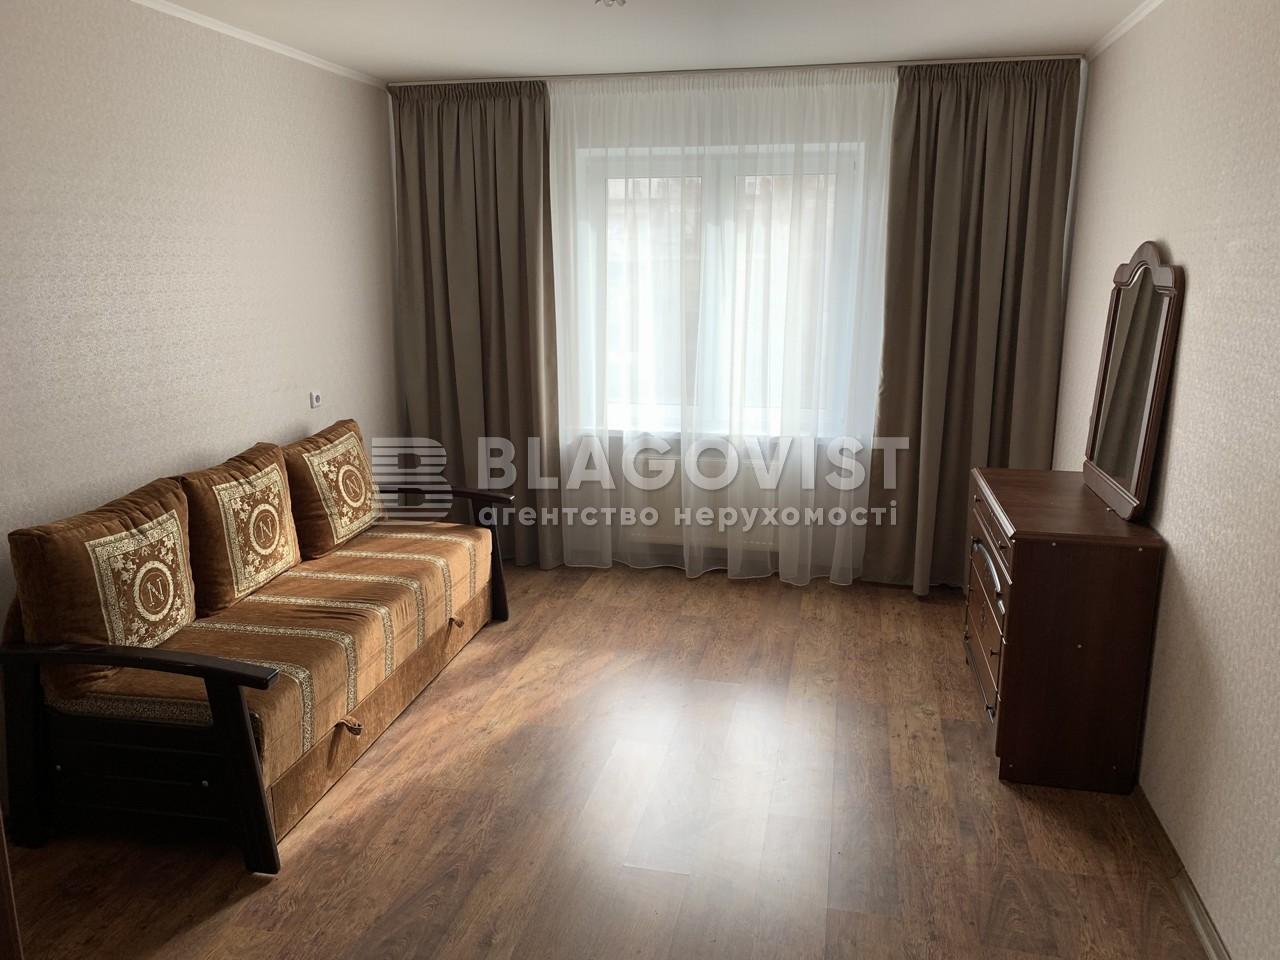 Квартира R-24472, Ясиноватский пер., 11, Киев - Фото 1